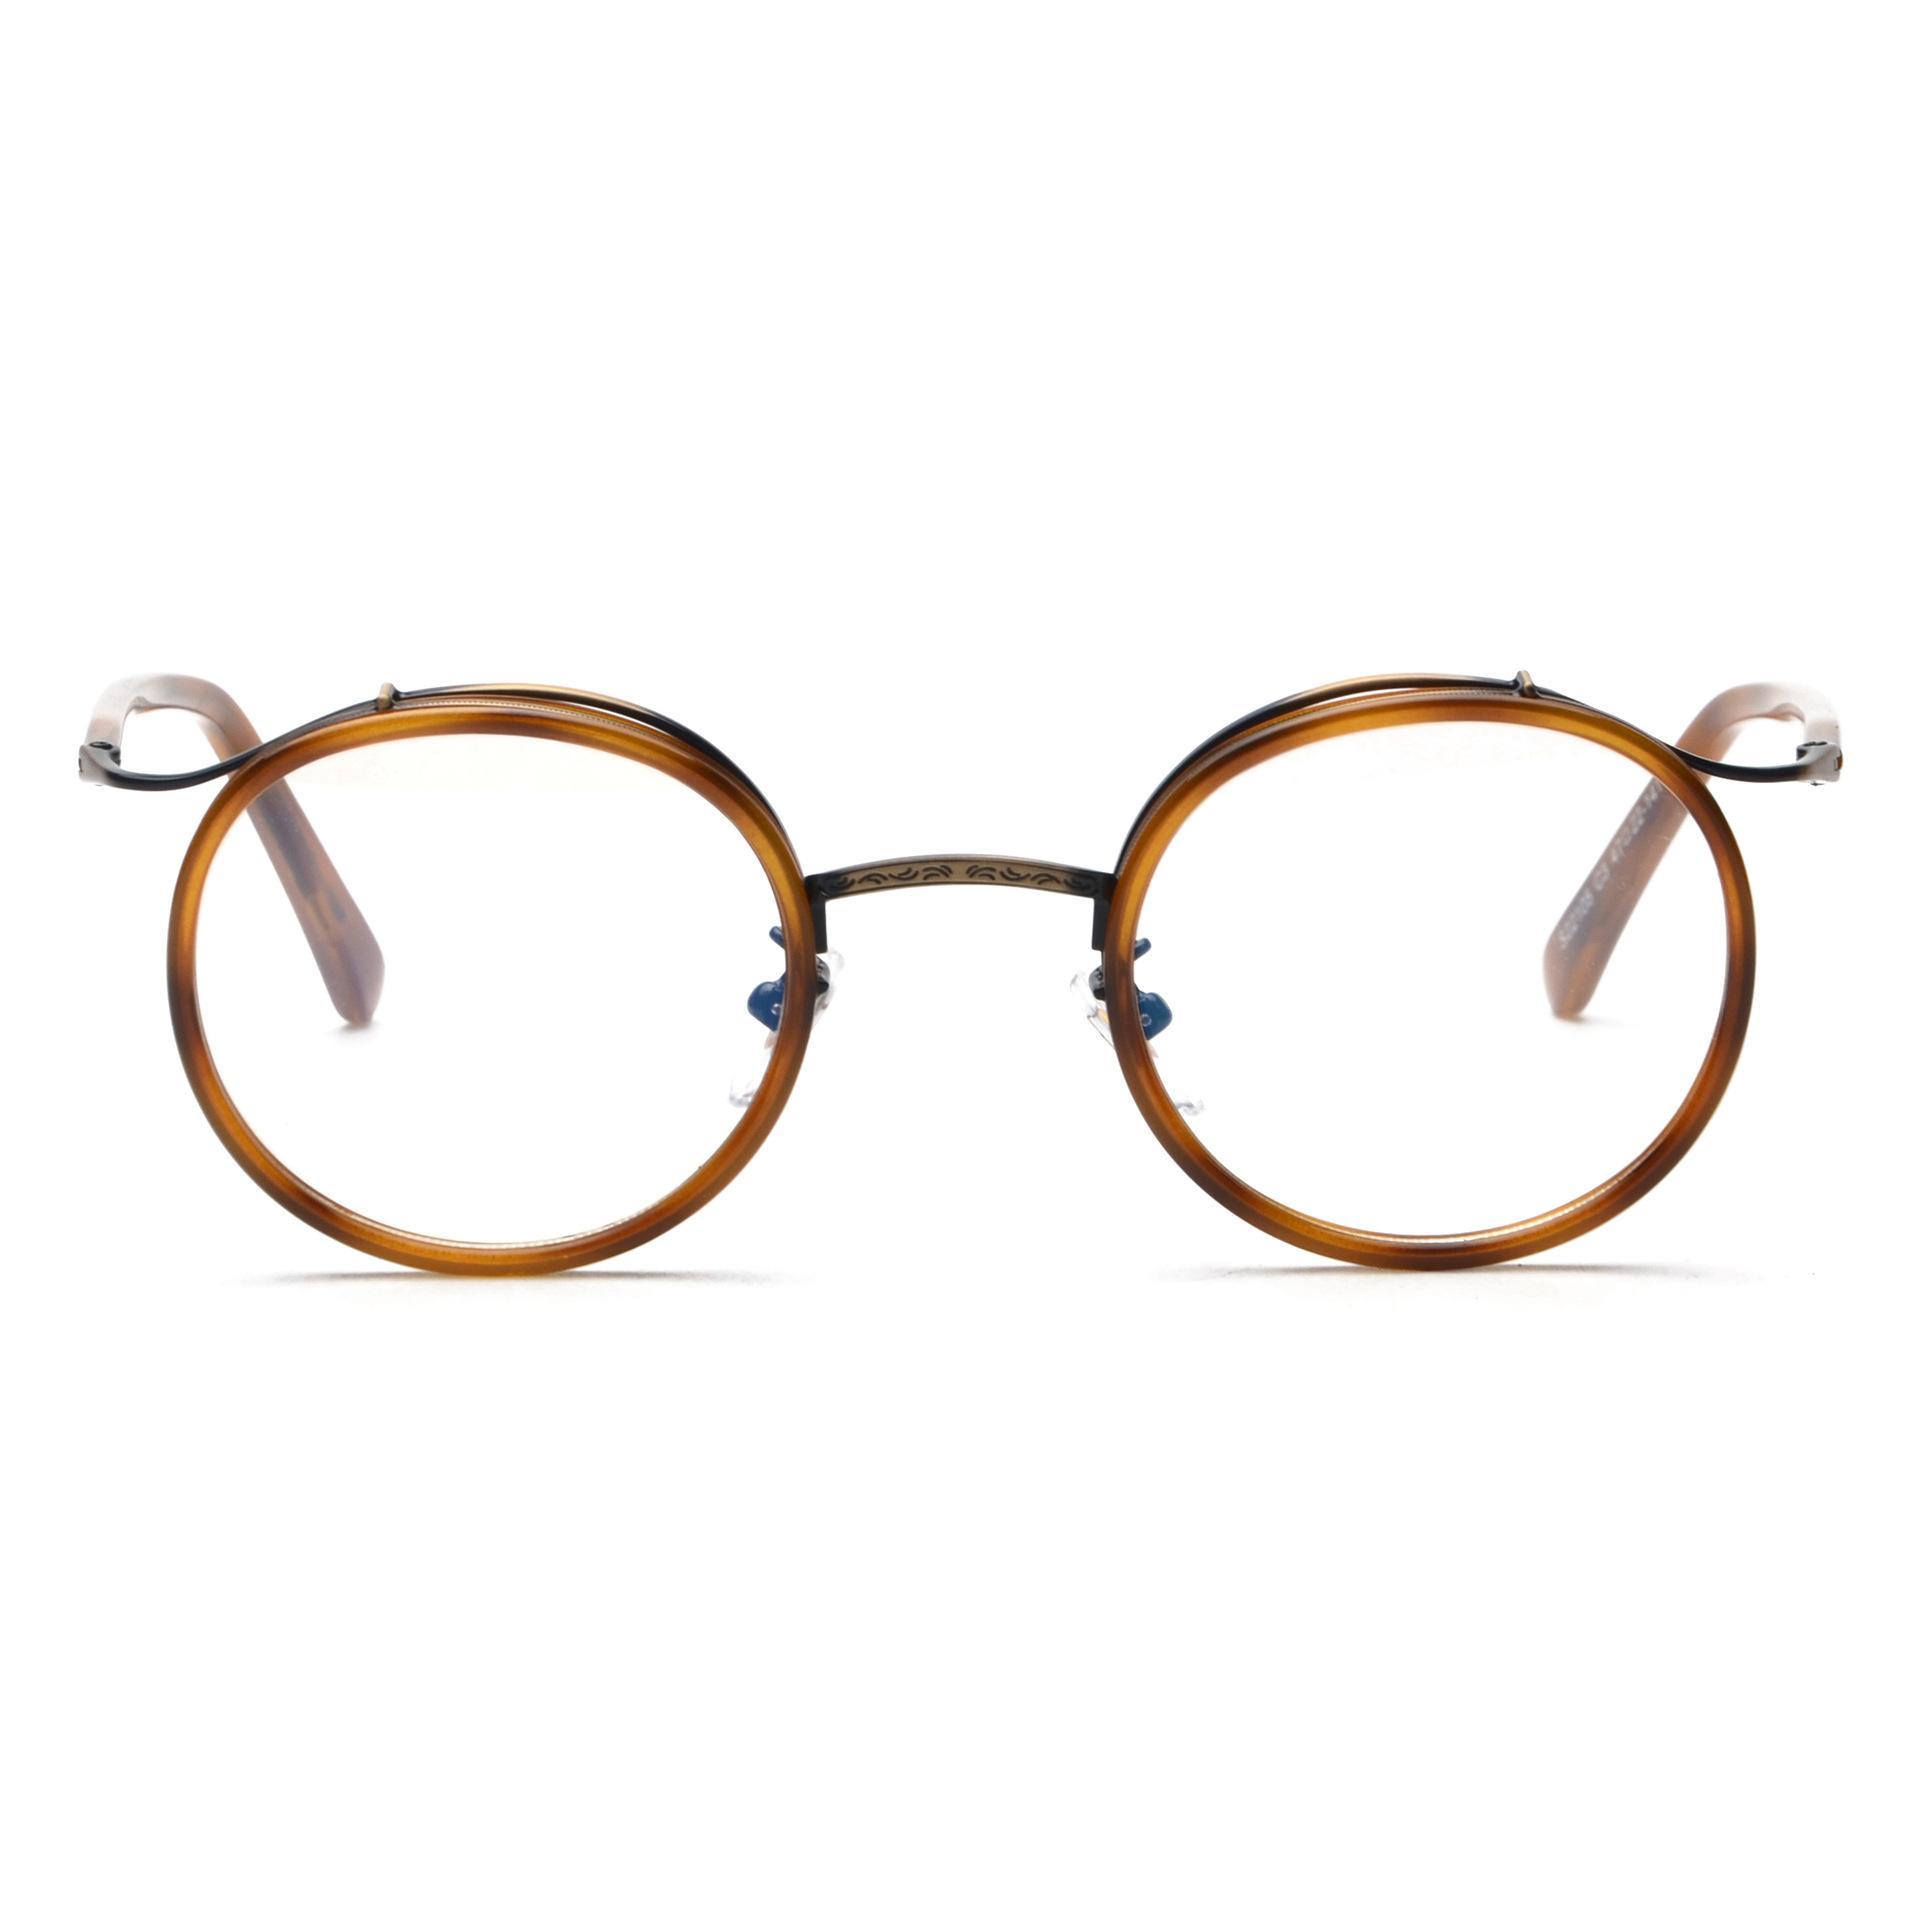 S22105 Korea TR90 retro logam kacamata rabun bingkai laki-laki pasang  perempuan kacamata rabun bingkai abc4f0d4f9